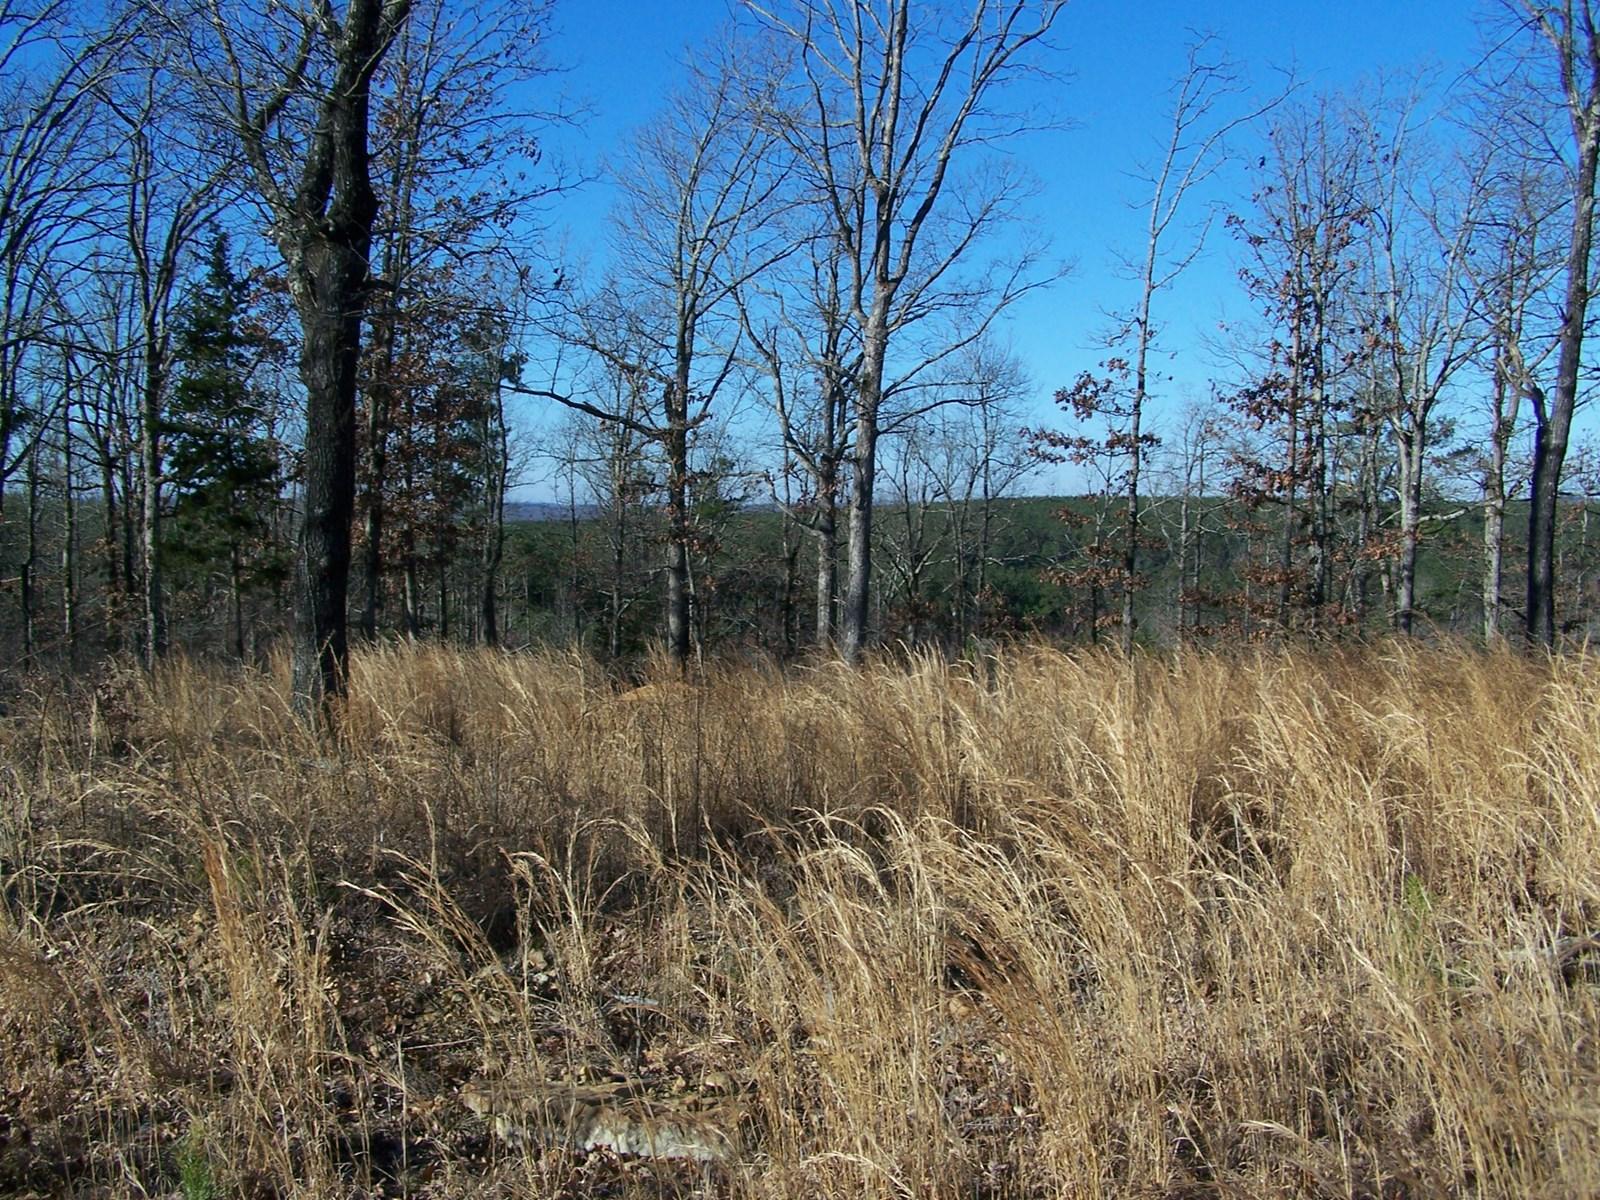 10 Acres of Land For Sale in Arkansas Ozarks